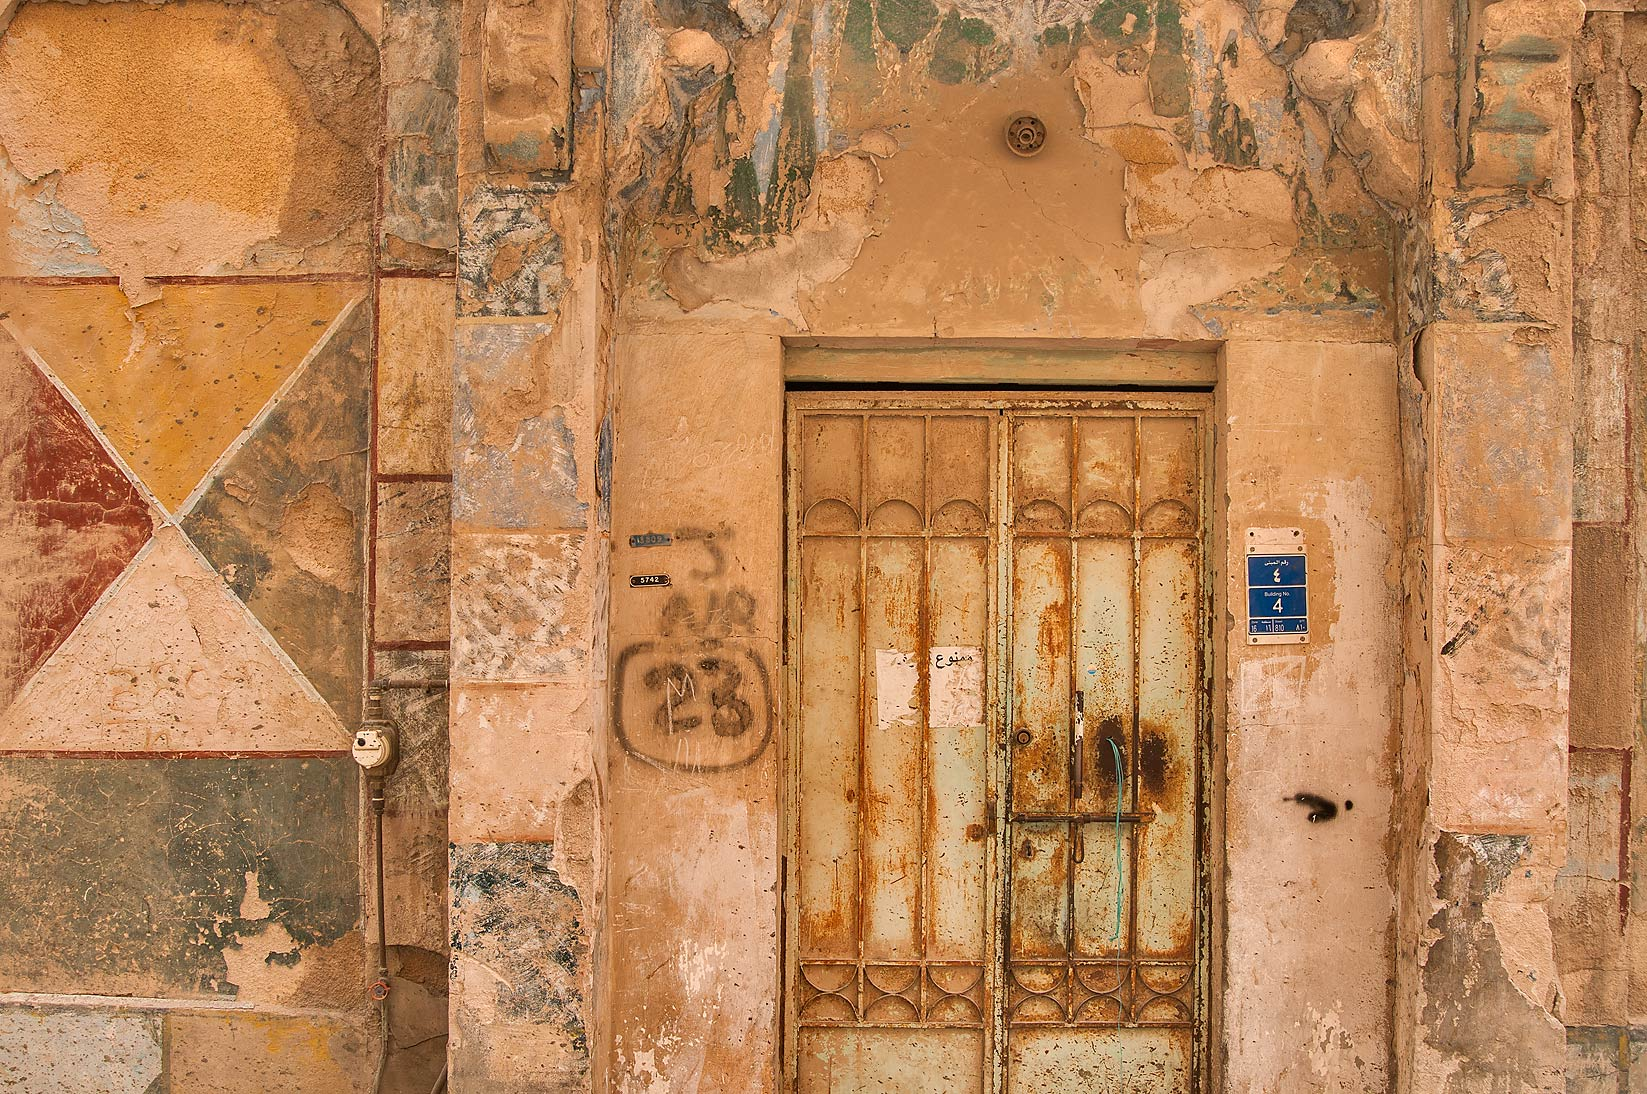 photo 1200 16 weathered painting on walls at 4 ibn abdul muttalib